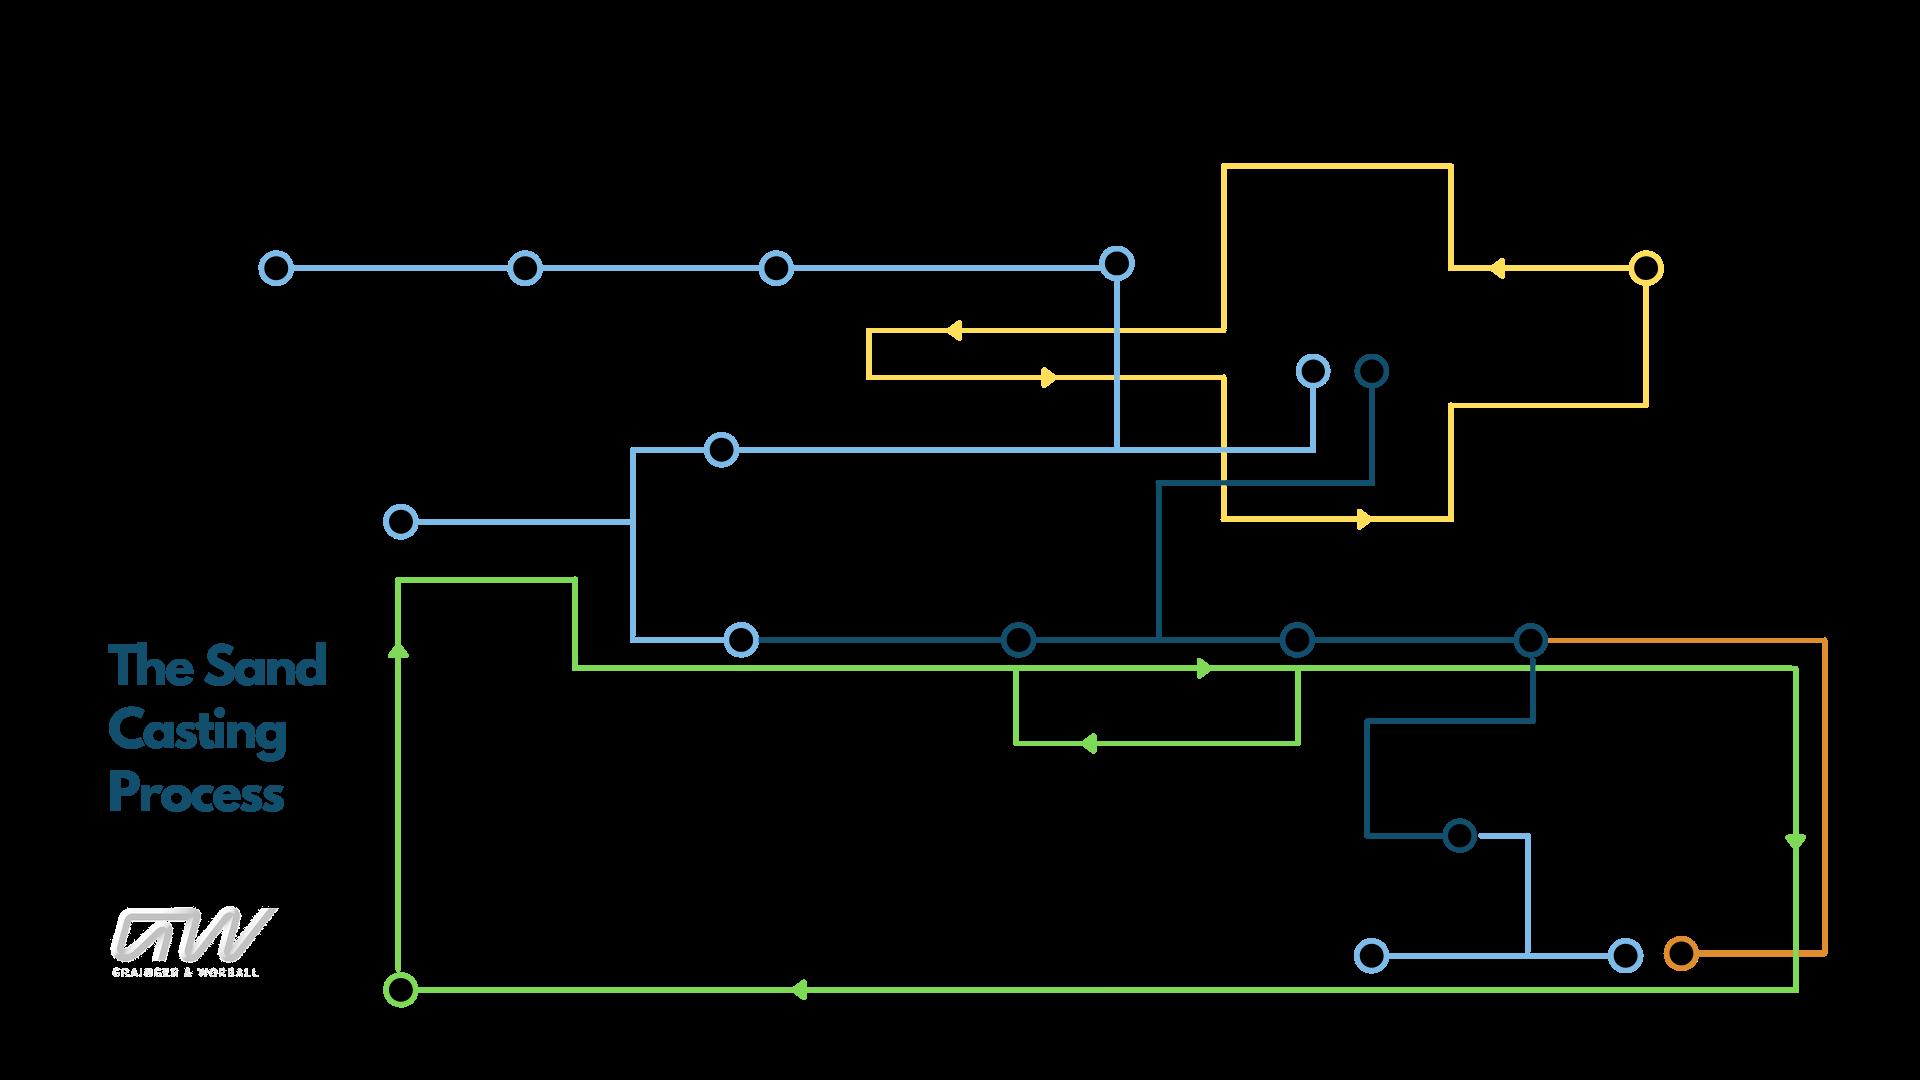 GW_Sand Casting Process Map v2T